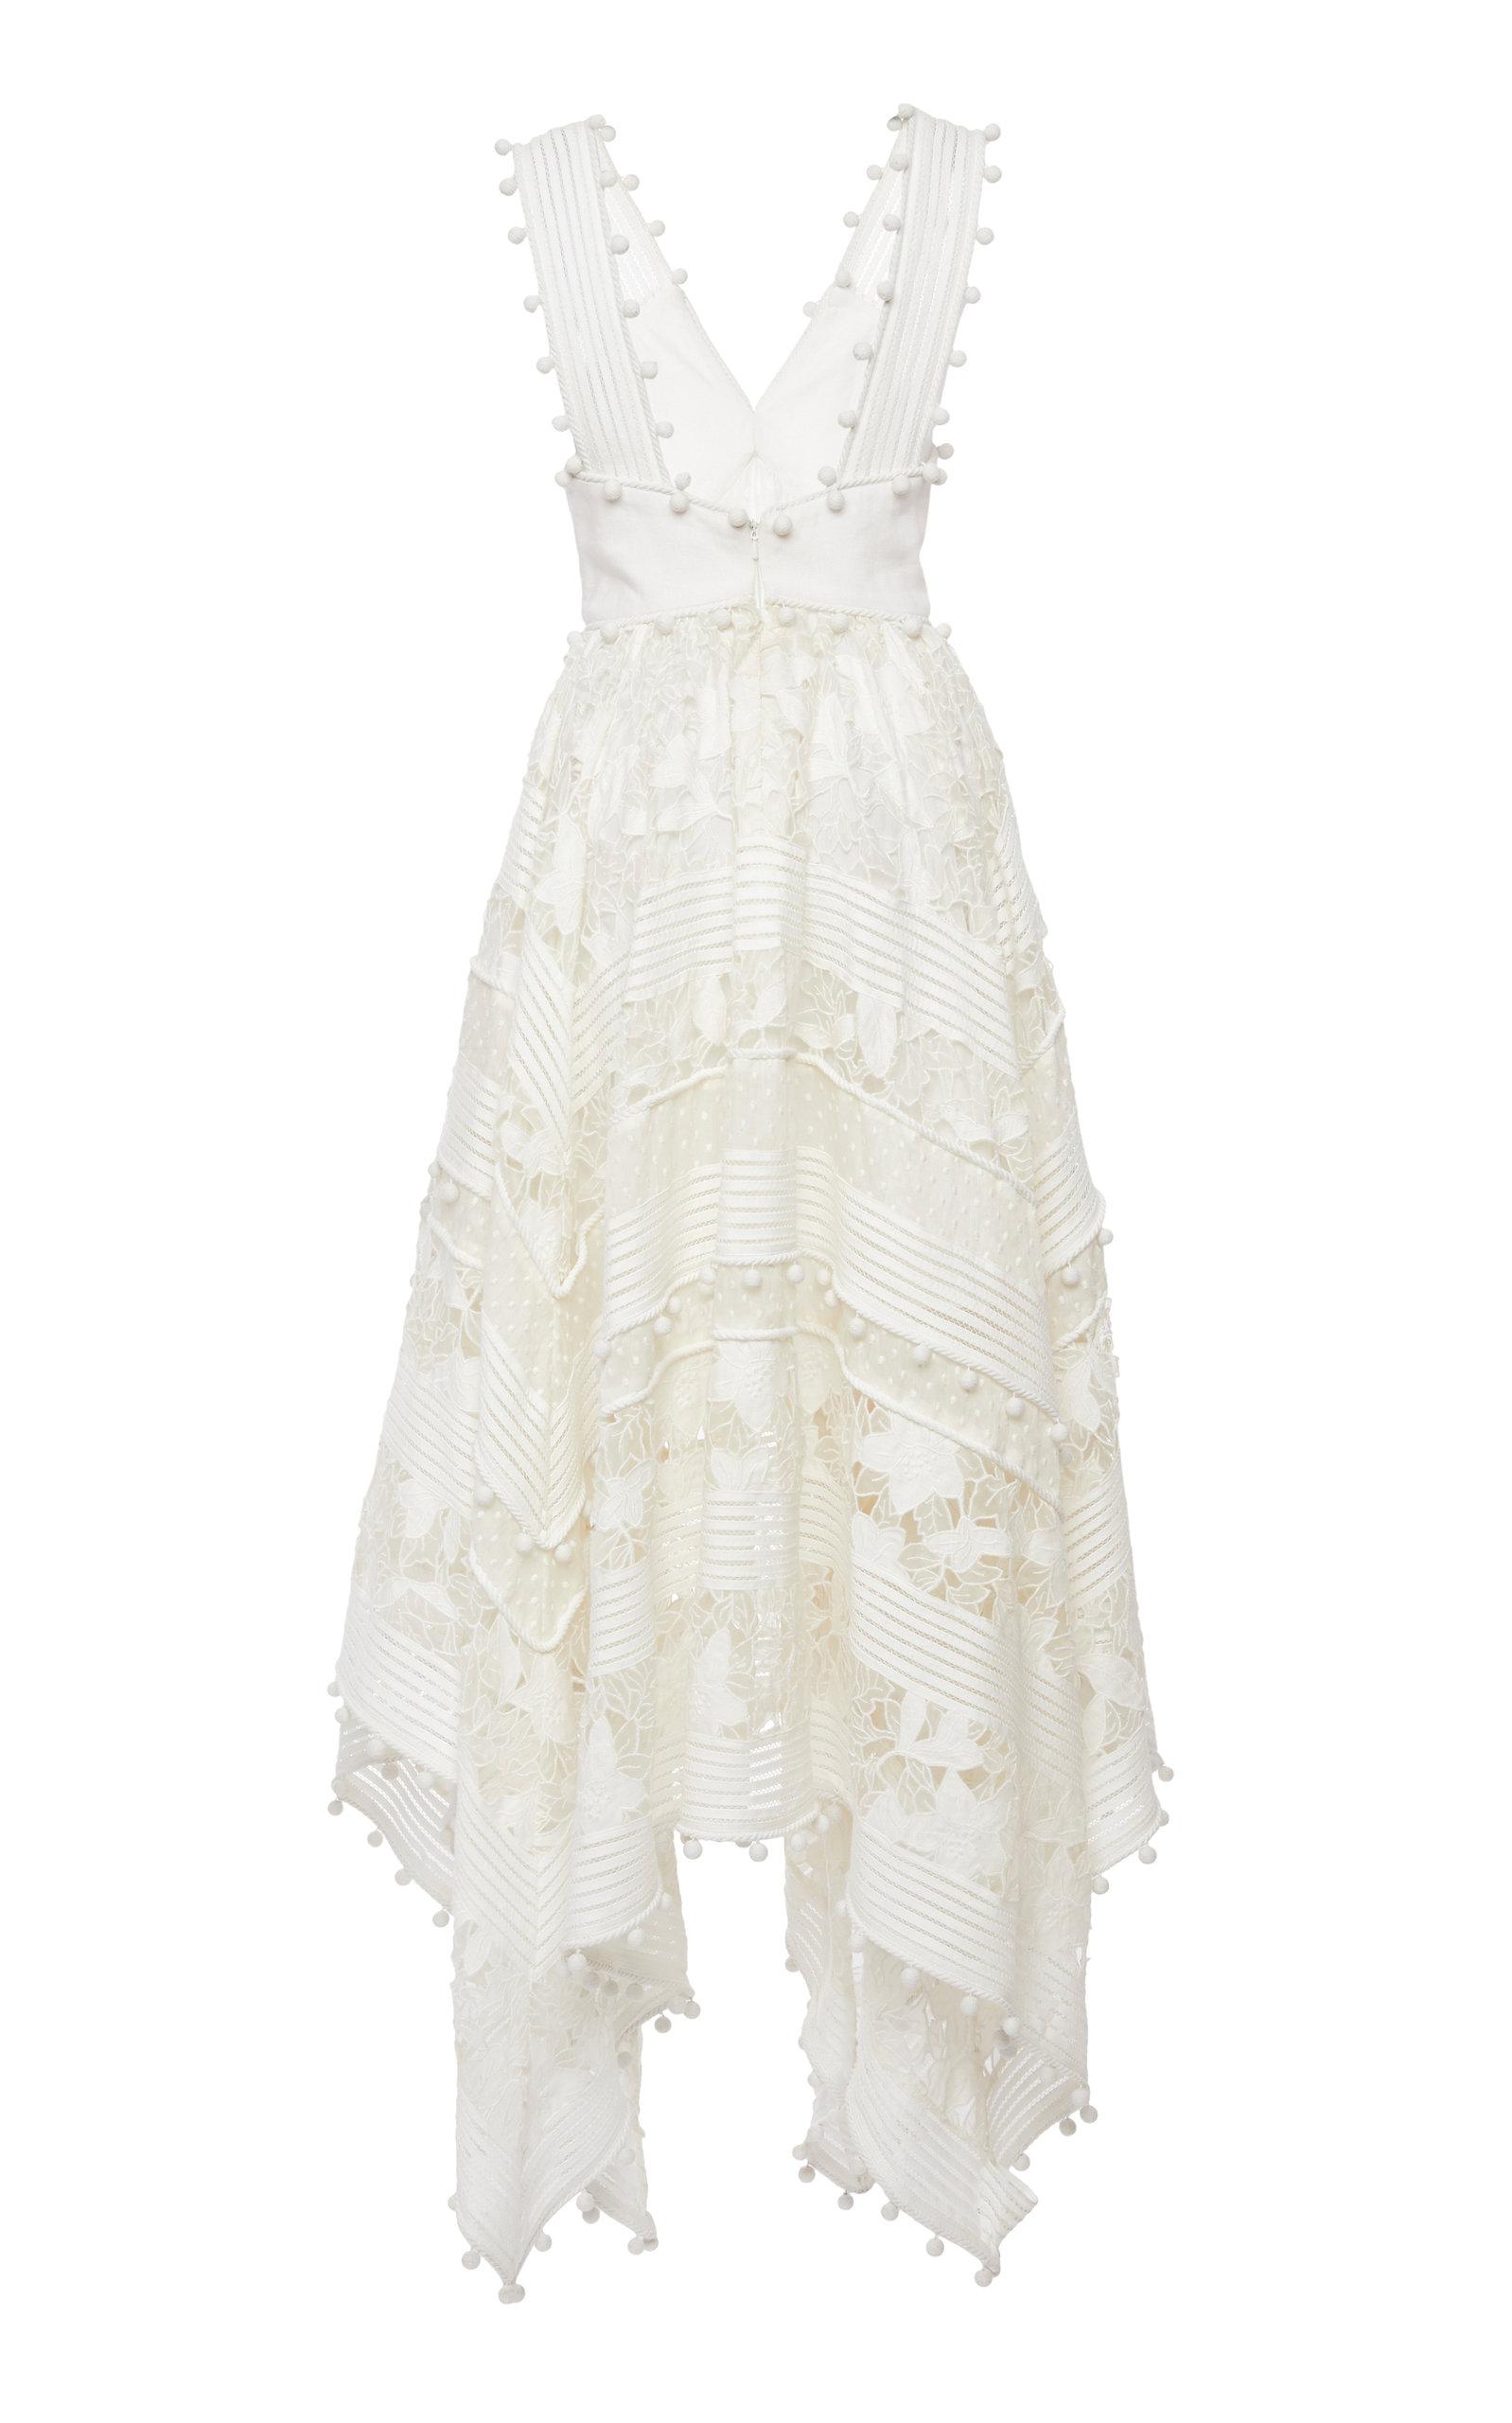 9f342997f5db ZimmermannCorsage Embellished Silk-Blend Midi Dress. CLOSE. Loading. Loading